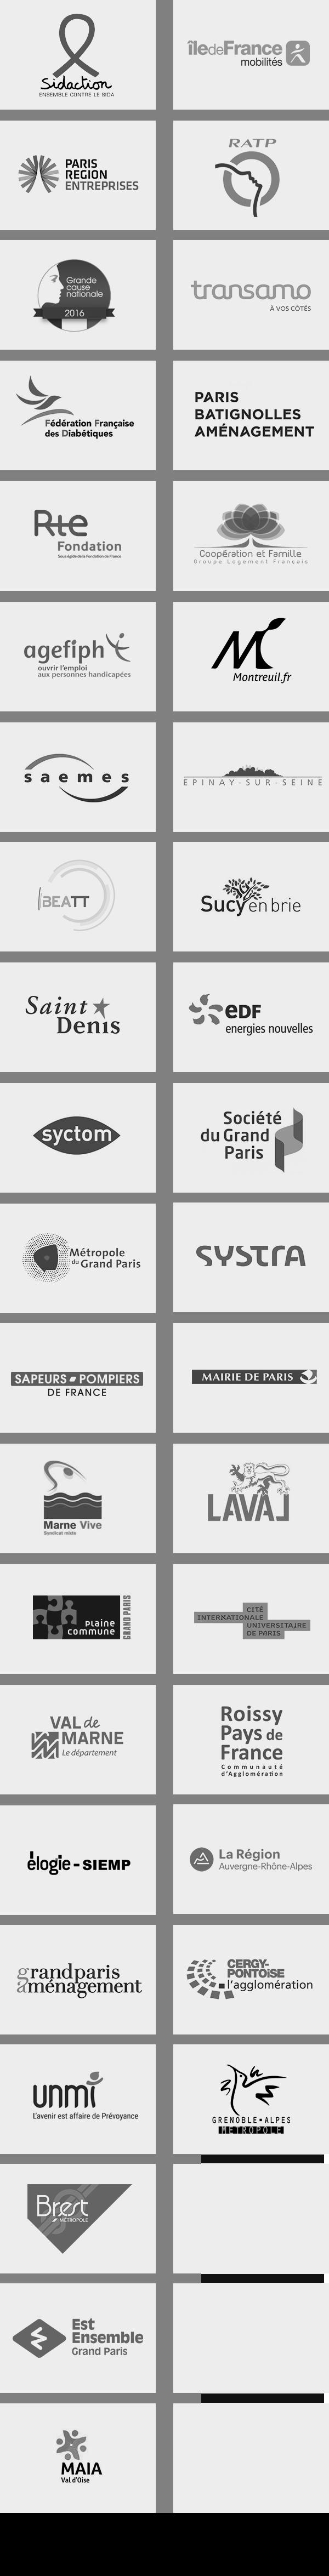 clients_stratéact'